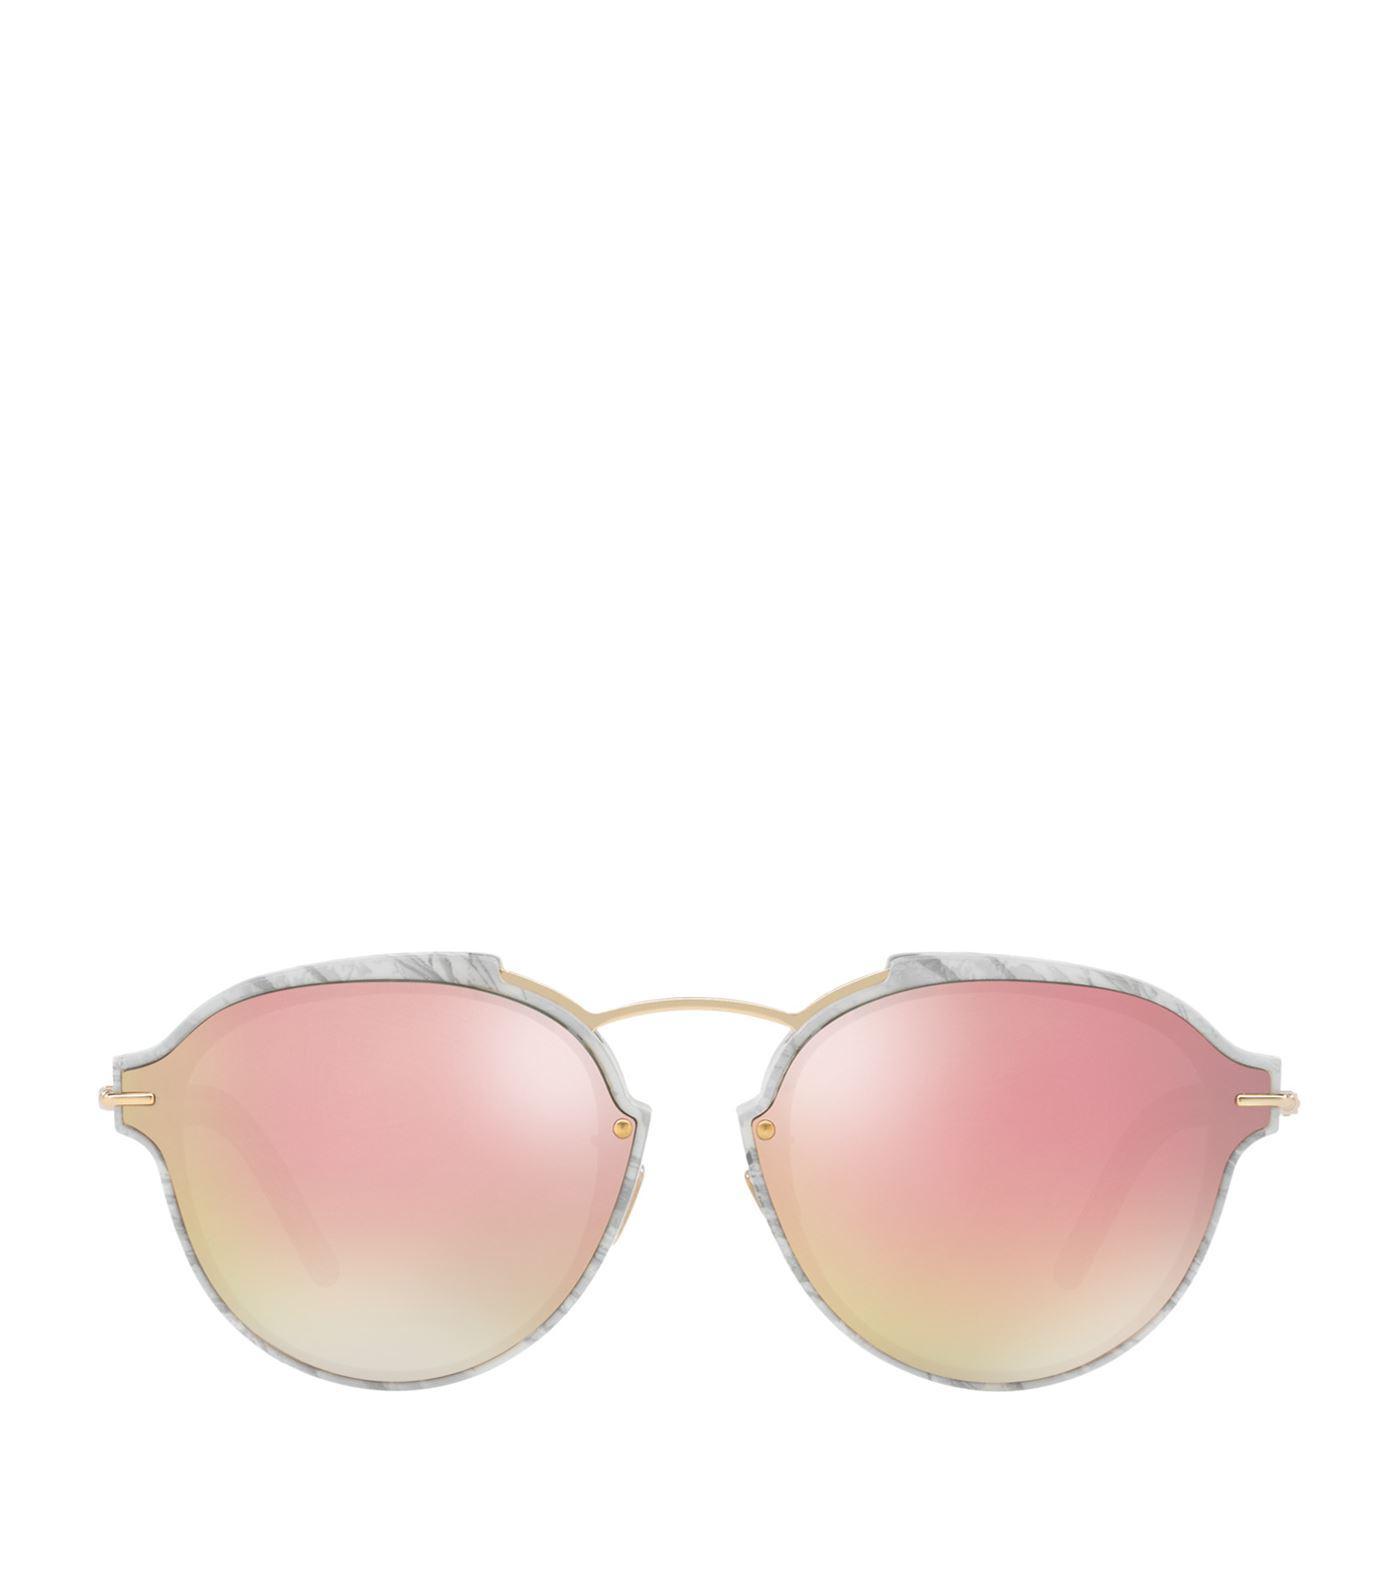 Dior Cd000755 Eclat Sunglasses In Grey